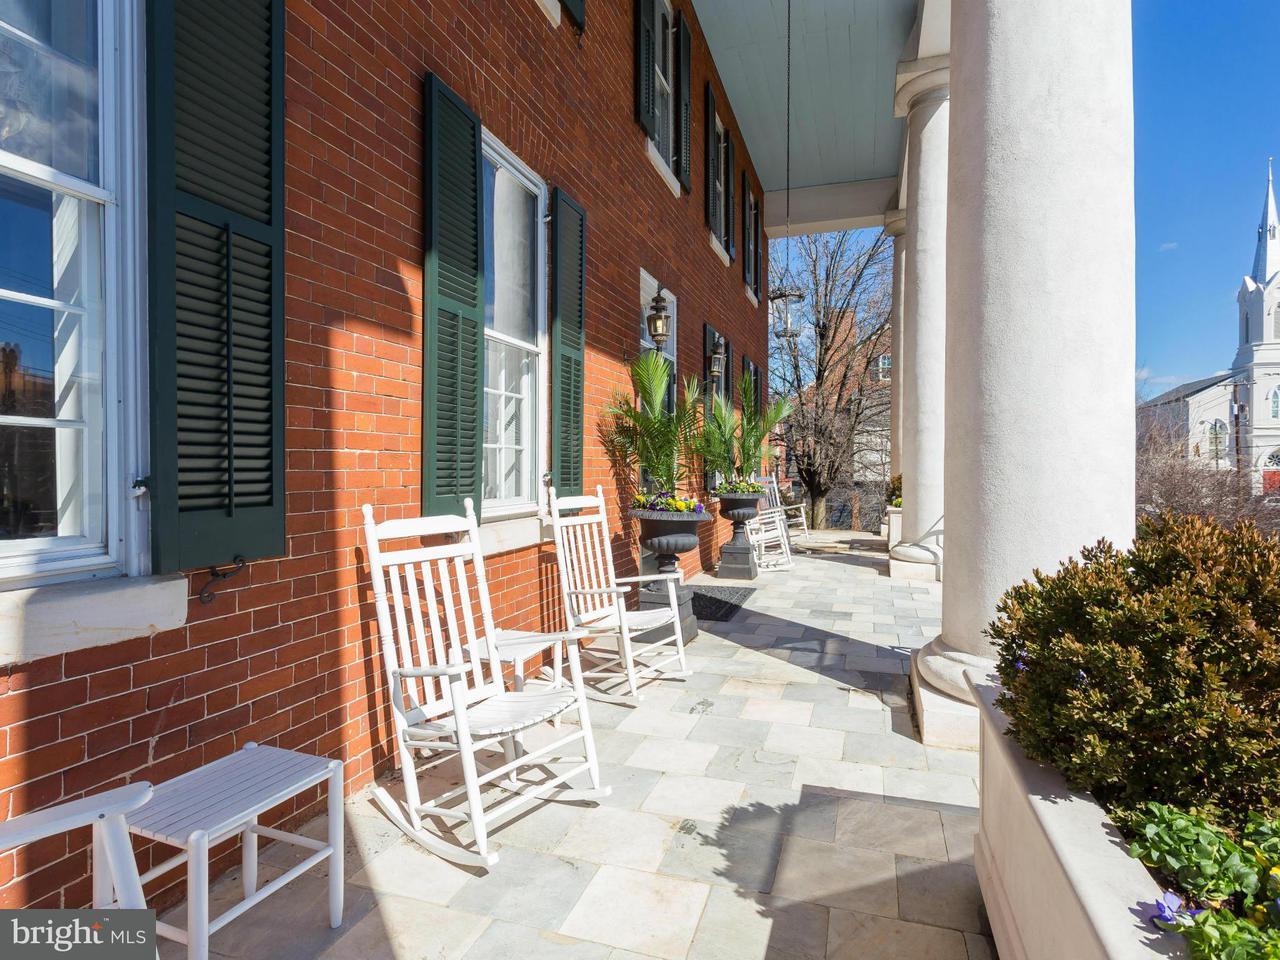 Single Family Home for Sale at 307 AMELIA Street 307 AMELIA Street Fredericksburg, Virginia 22401 United States